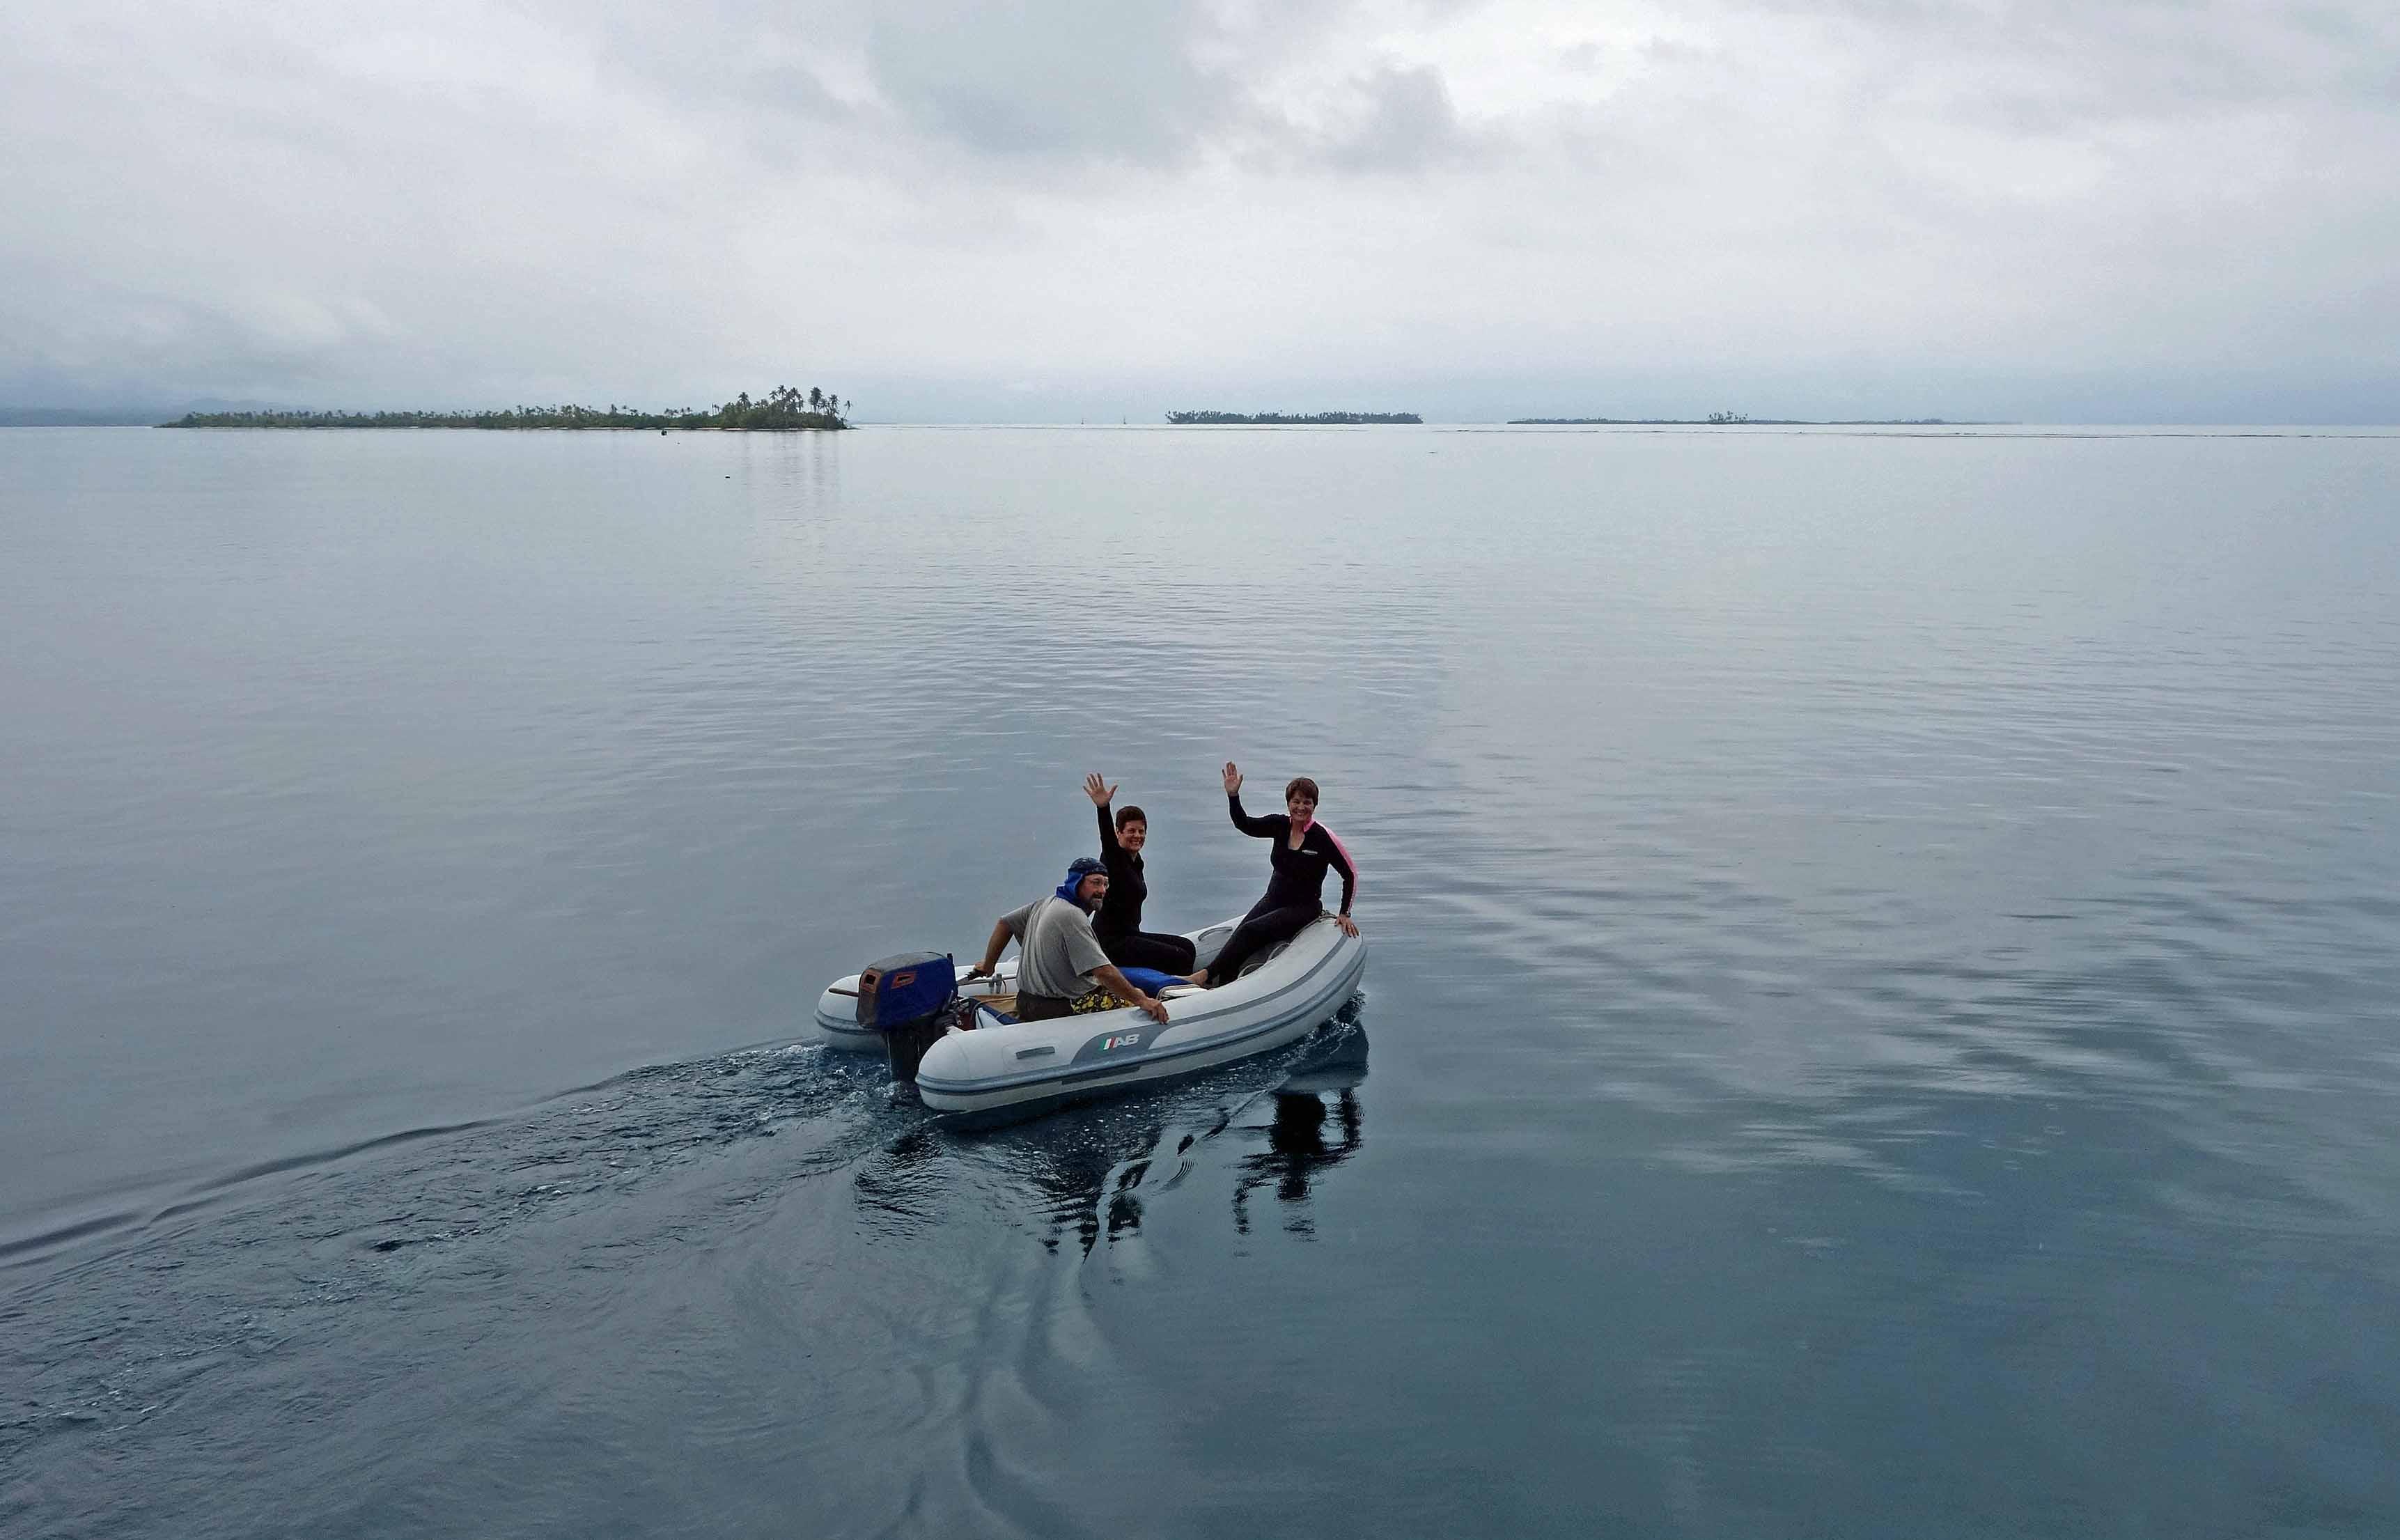 Dingy to nearby snorkel site, Guna Yala islands, Panama